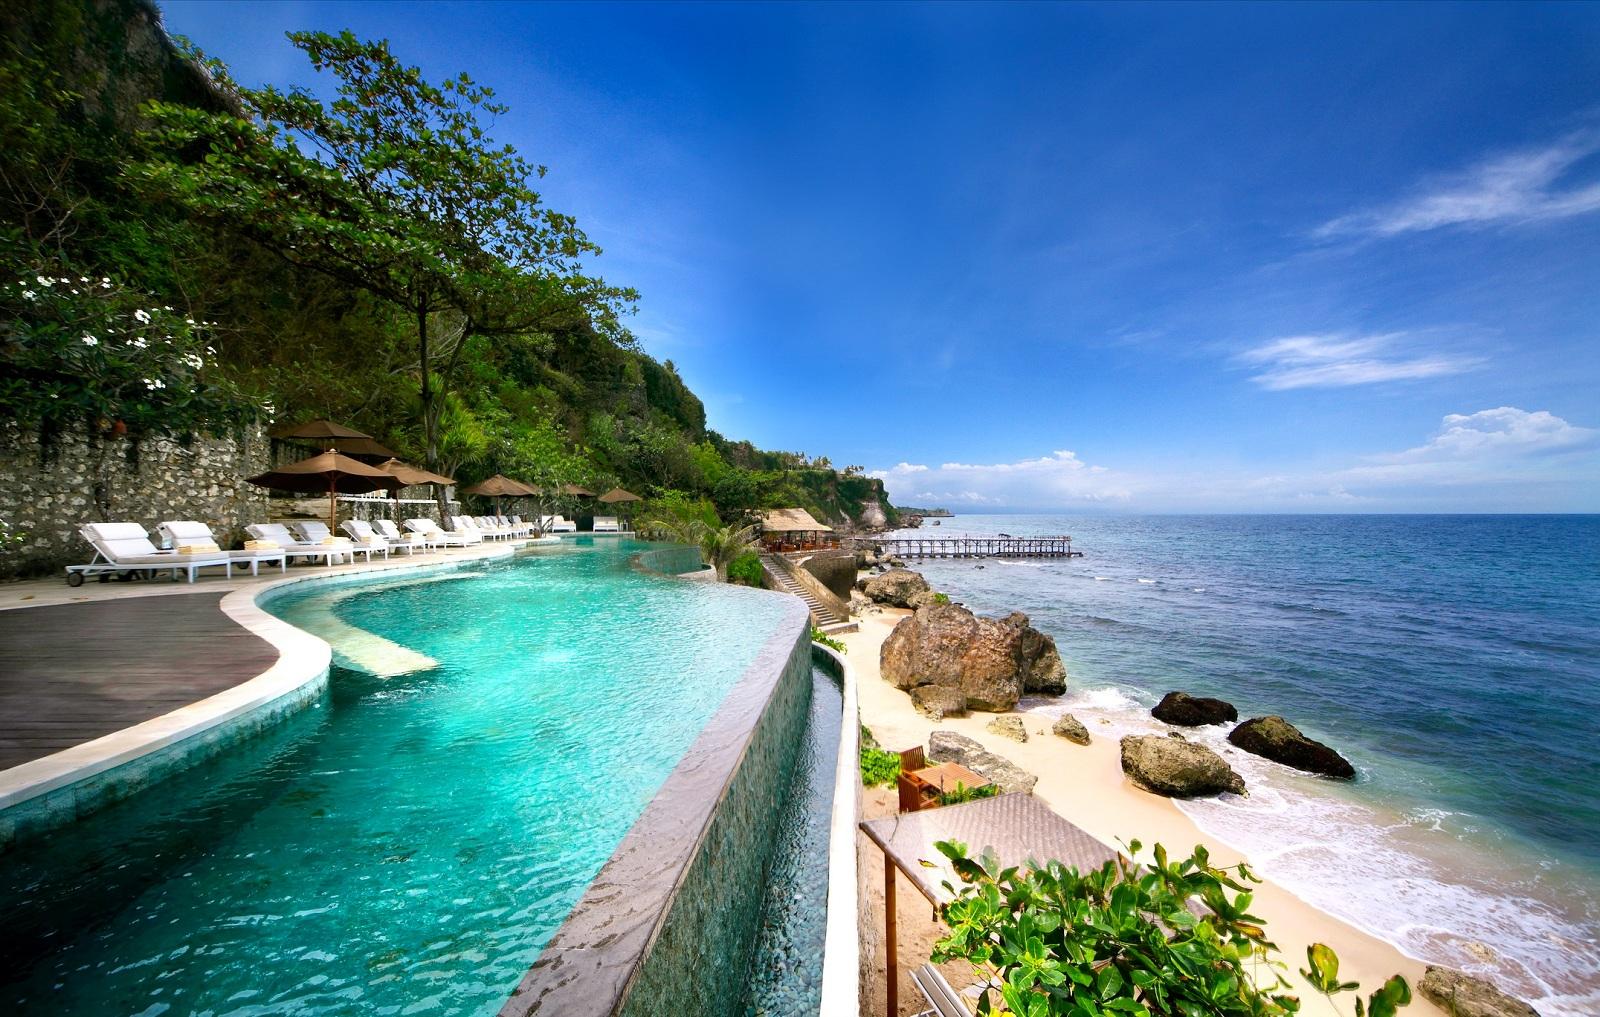 Liburan Seru Nan Cantik Di Pulau Bali 4d3n Lanalouie